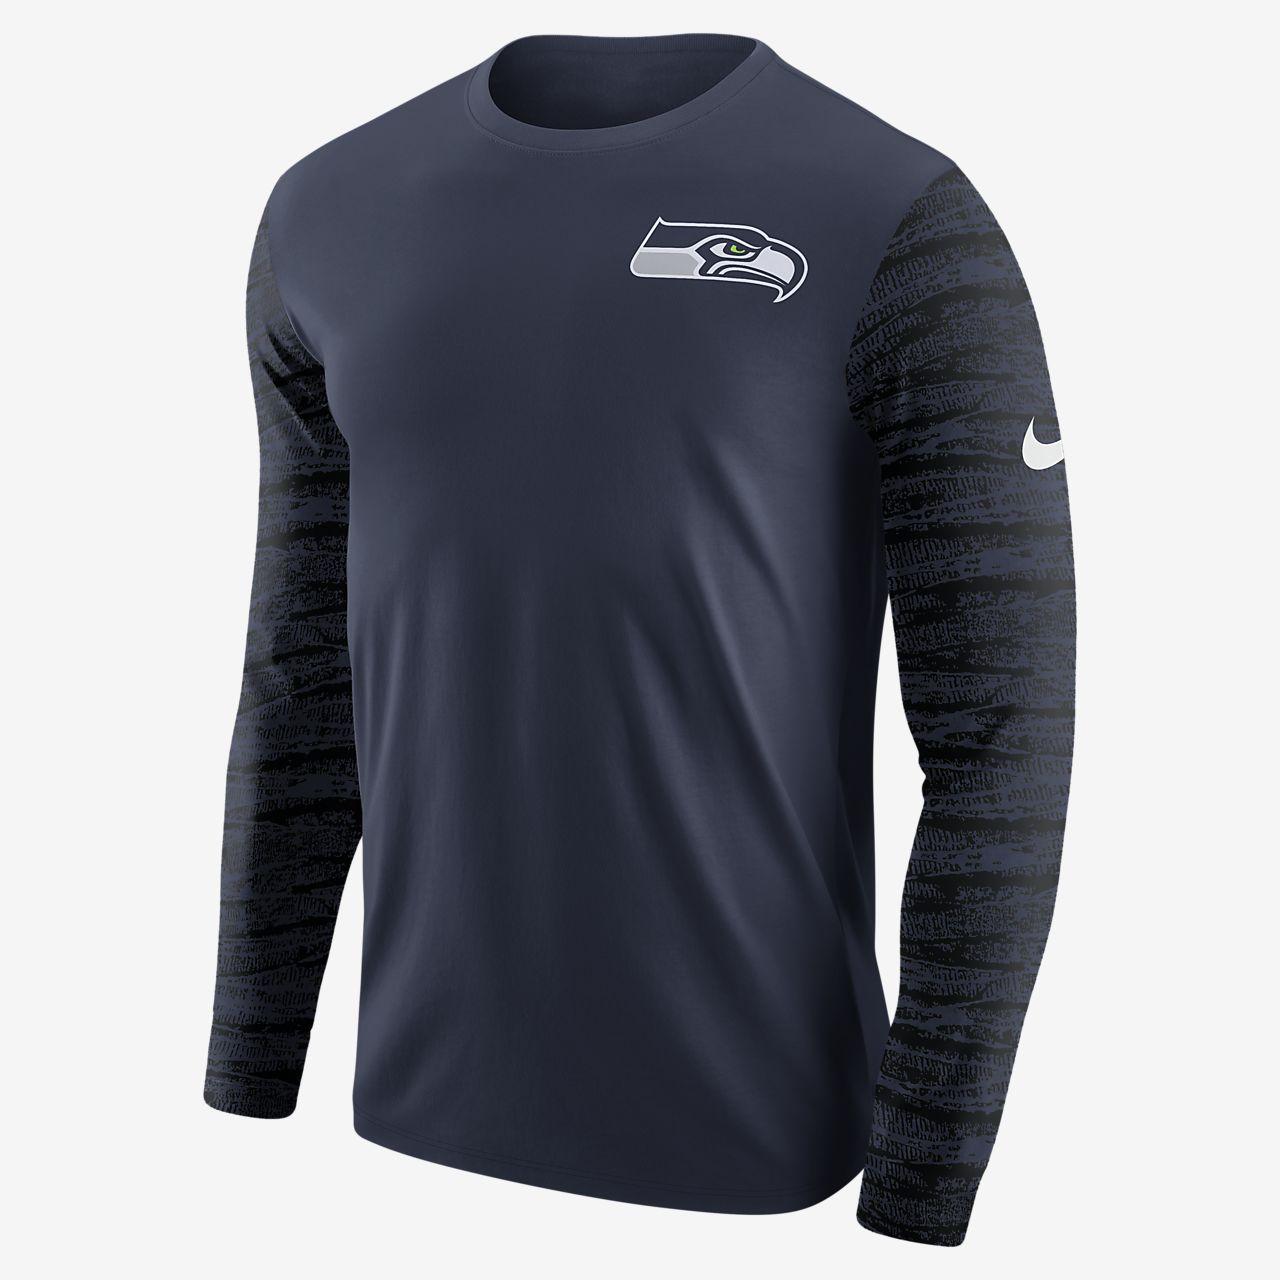 Enzyme Tee Longues Seahawks Pour Pattern Nike Shirt À nfl Manches qfqnwURF